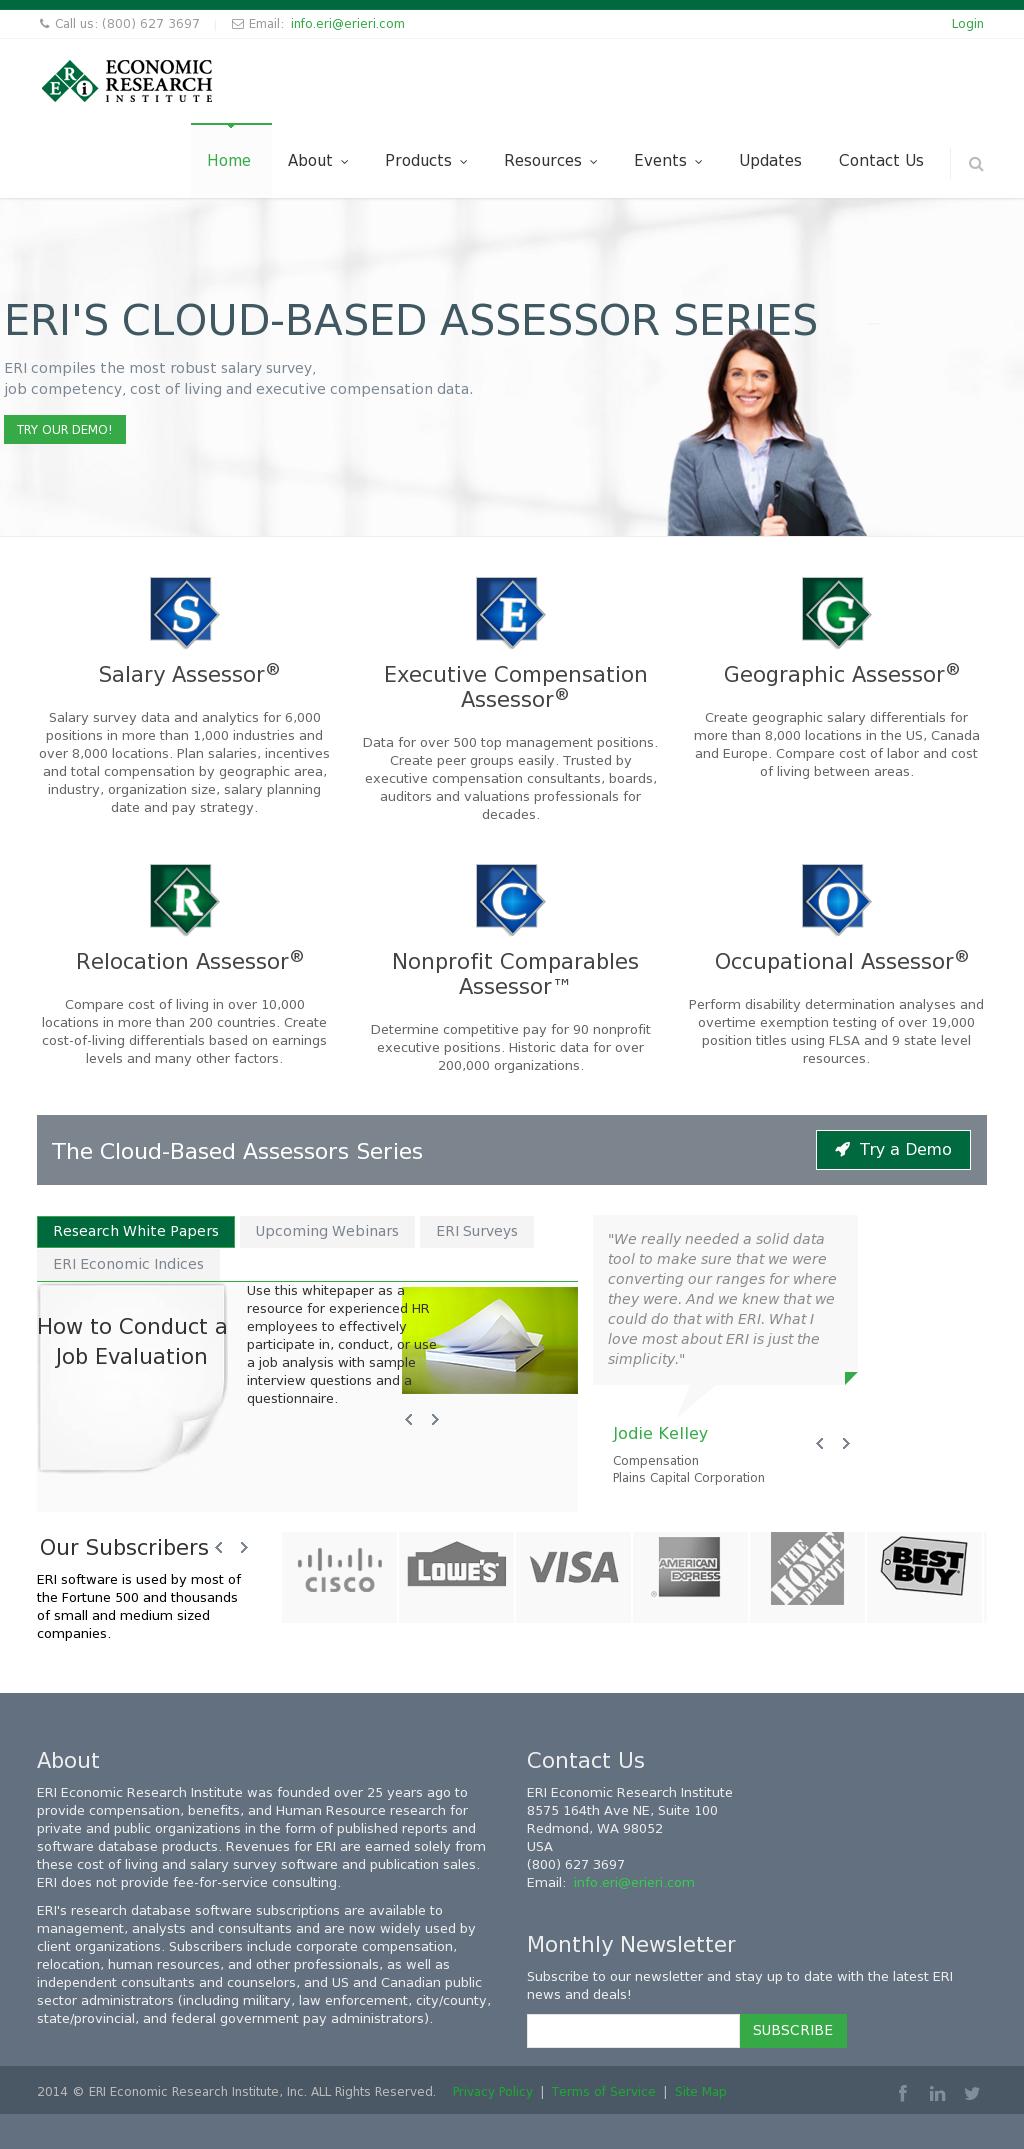 Erieri Competitors, Revenue and Employees - Owler Company Profile